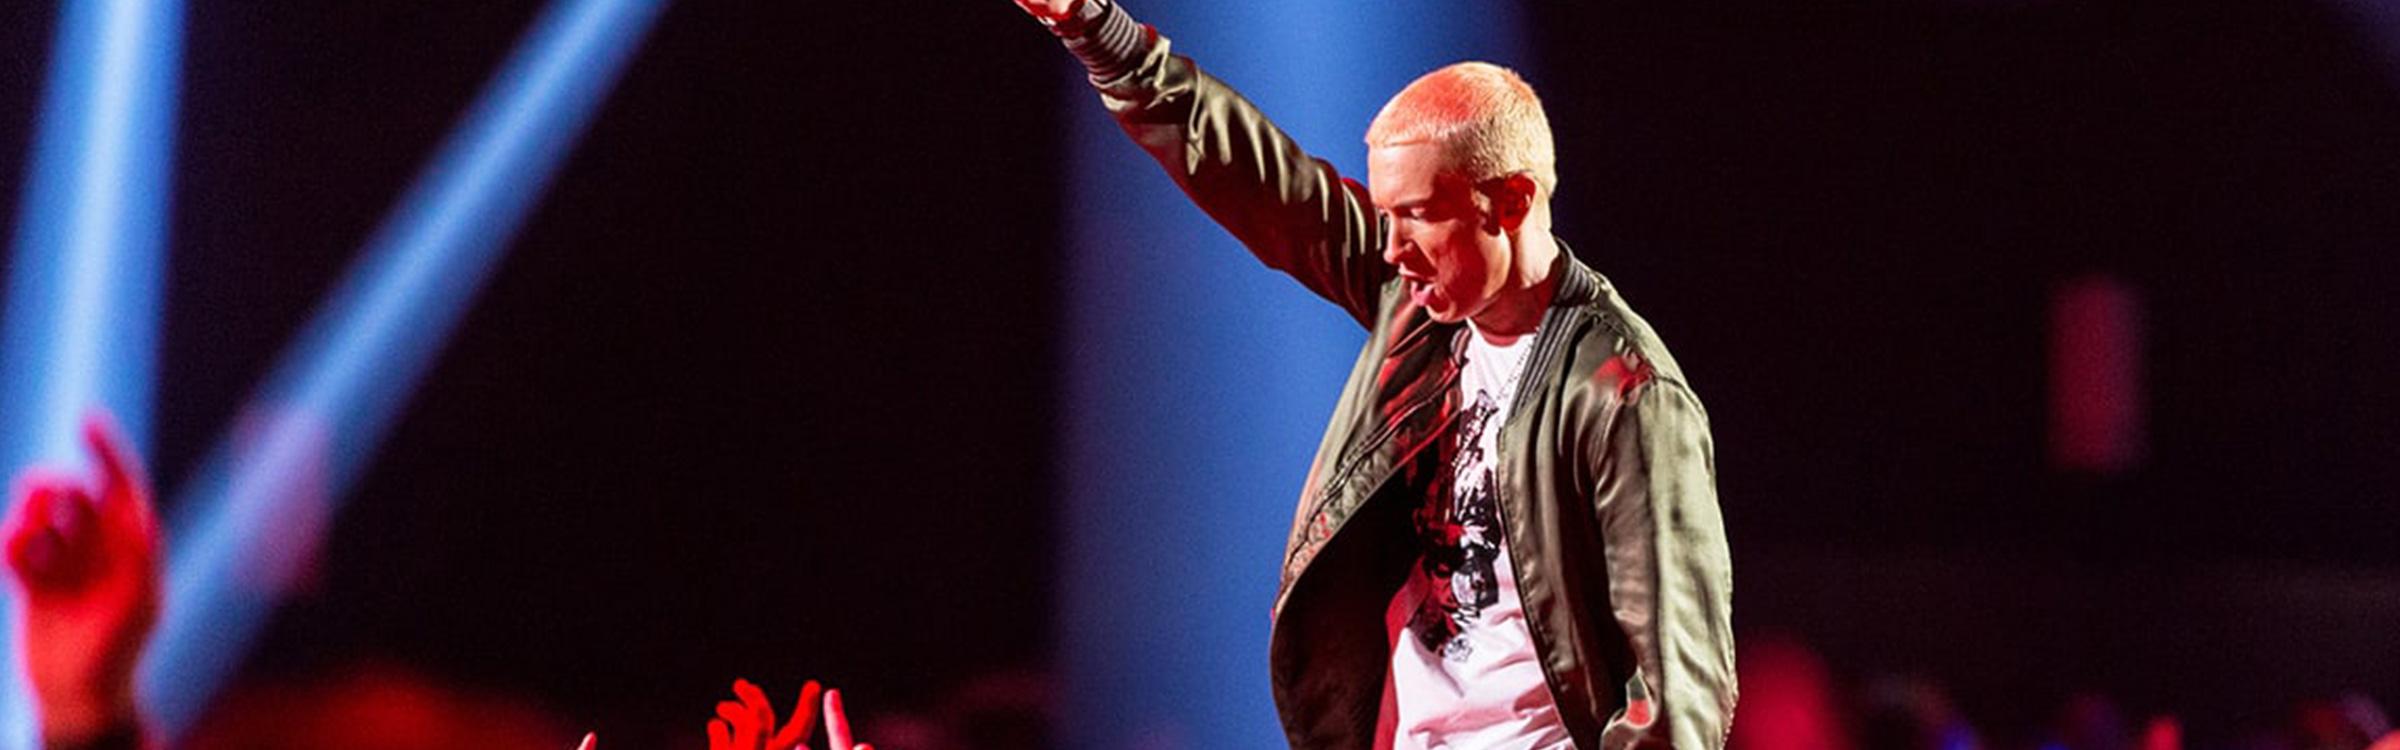 Eminemheaderk